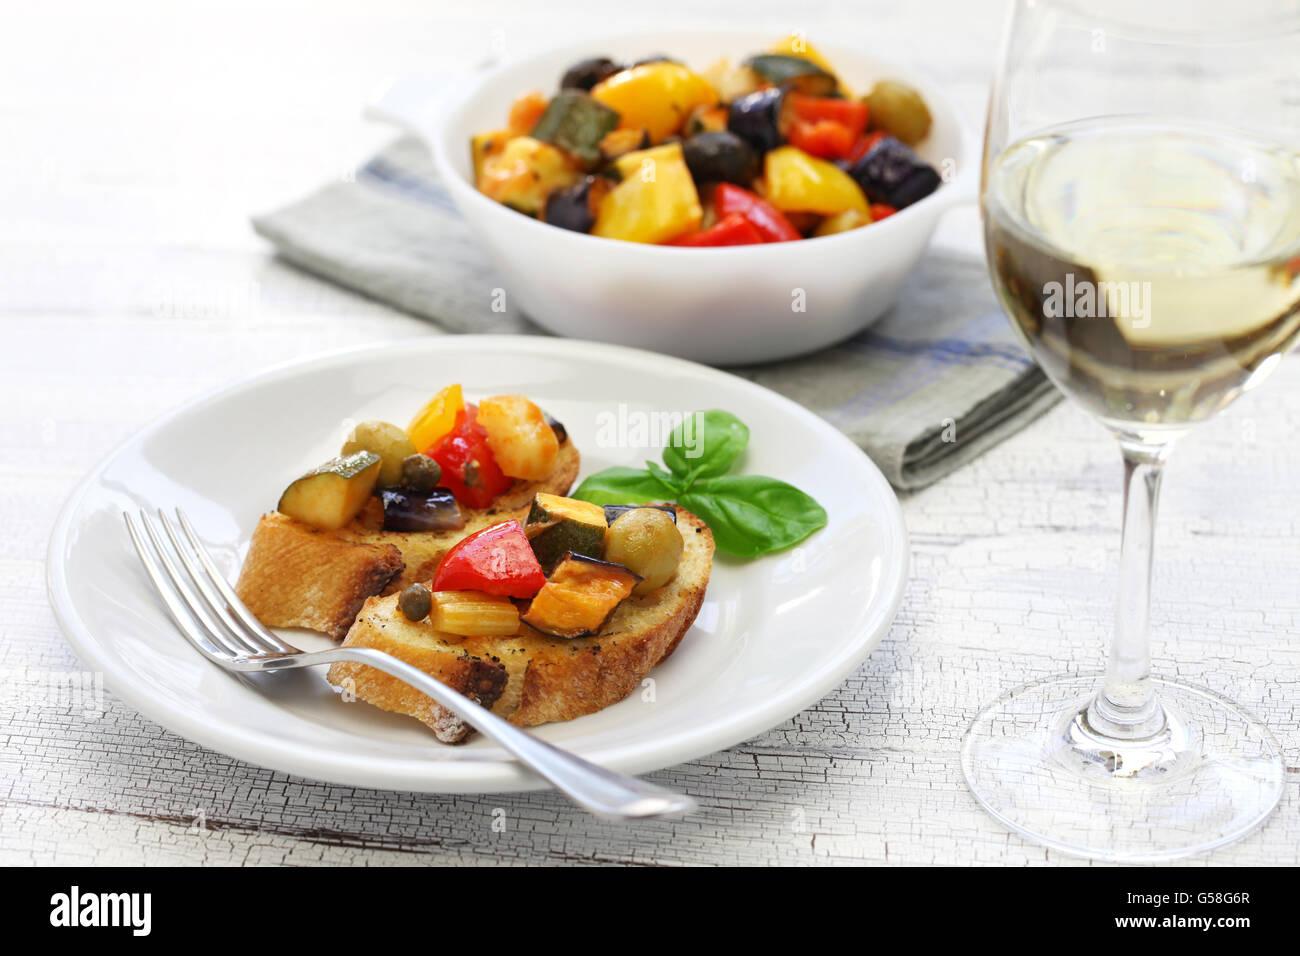 caponata, italian sicilian eggplant aubergine vegetable stew - Stock Image